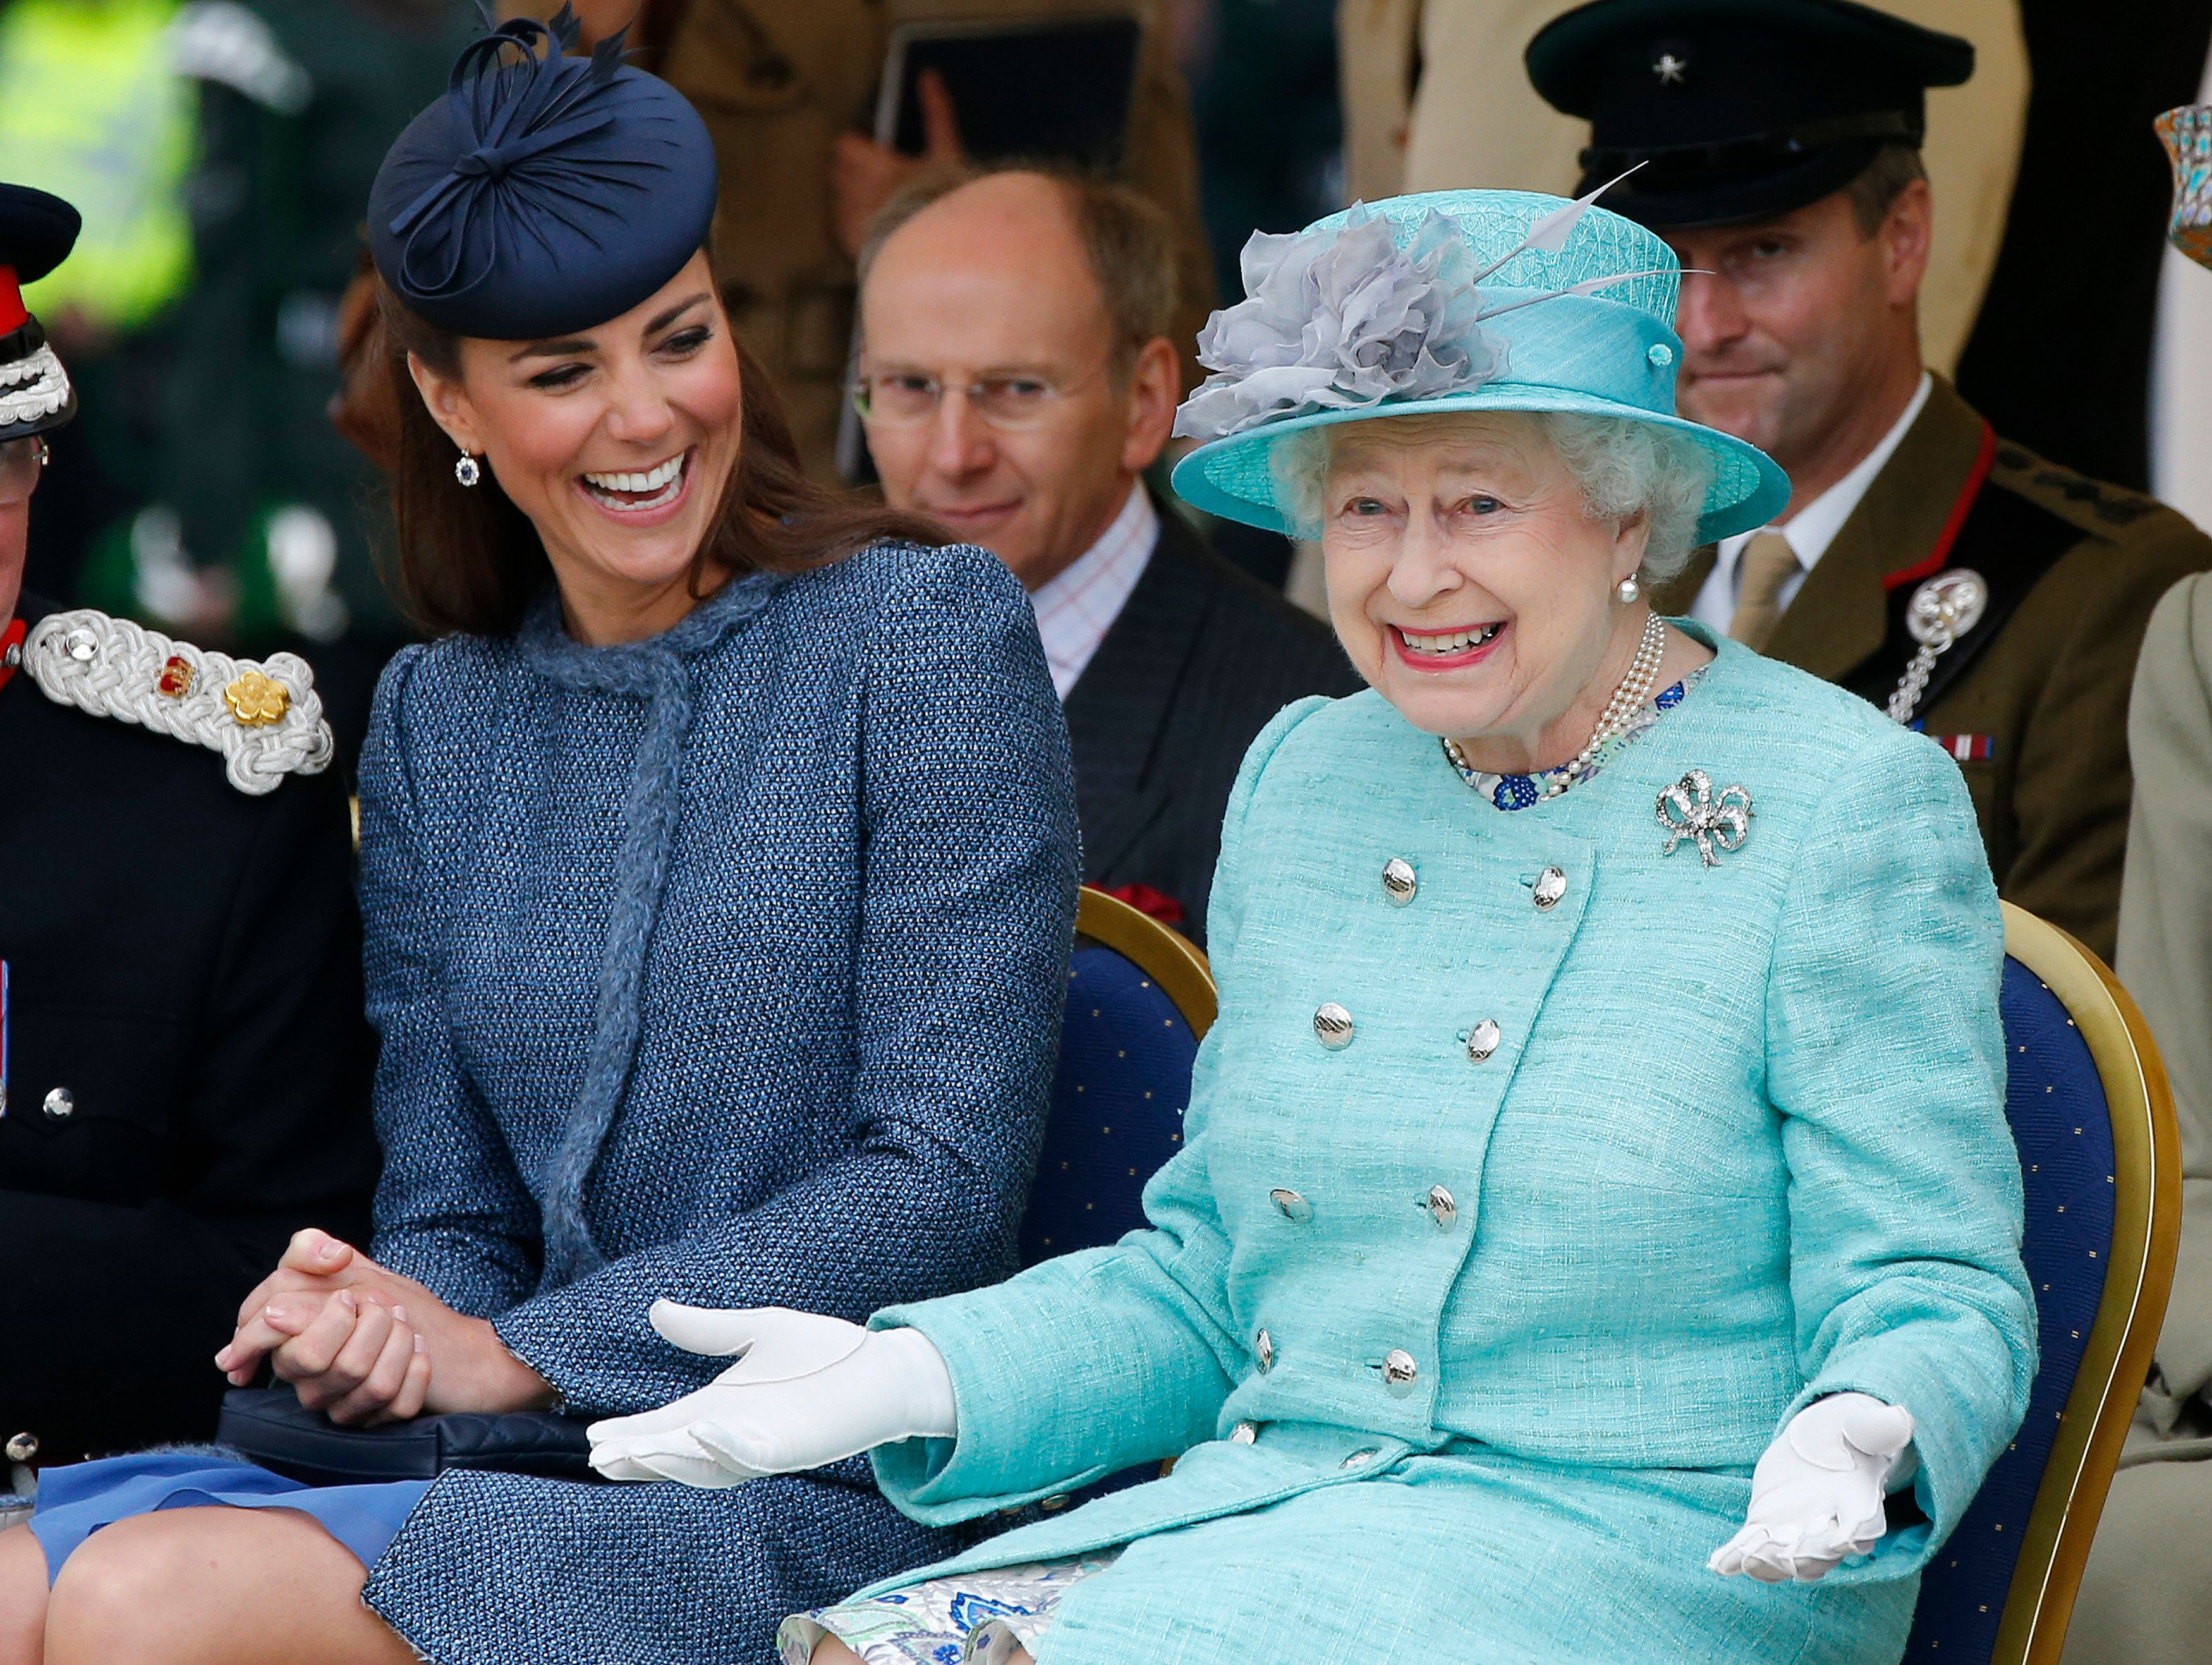 Royal-Expertin: Deshalb mag die Queen Kate lieber als Meghan